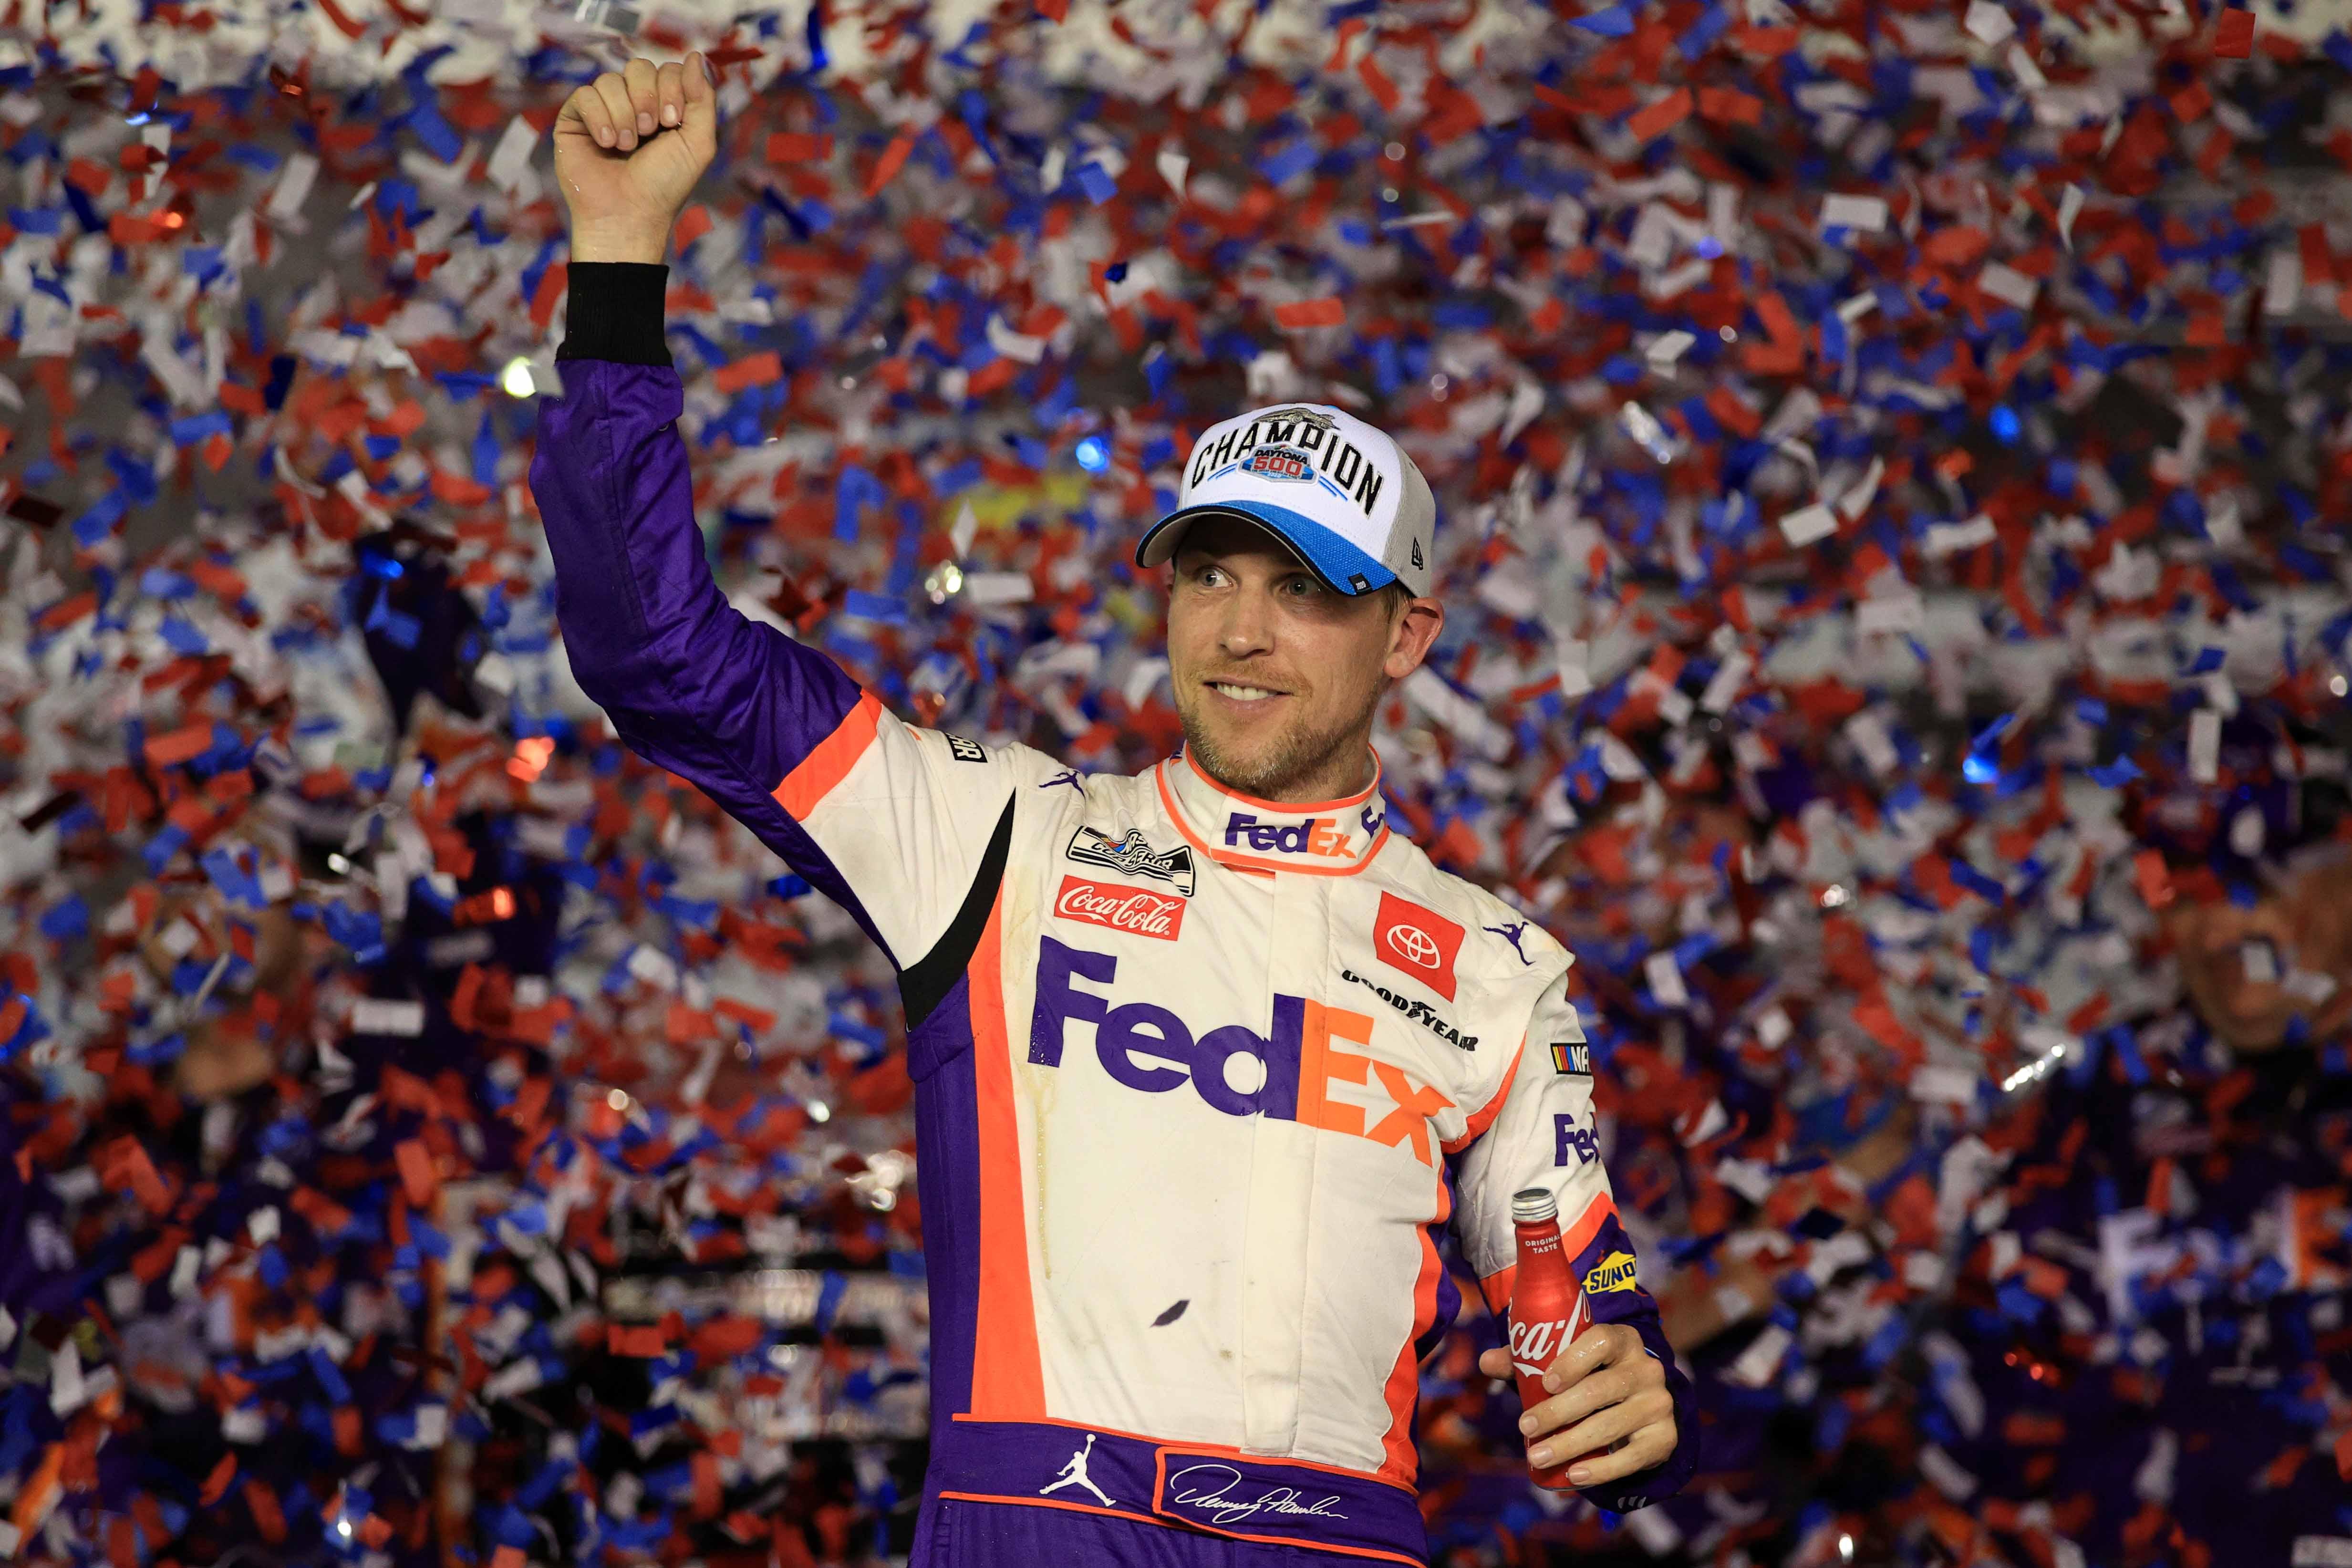 Denny Hamlin wins 2020 Daytona 500